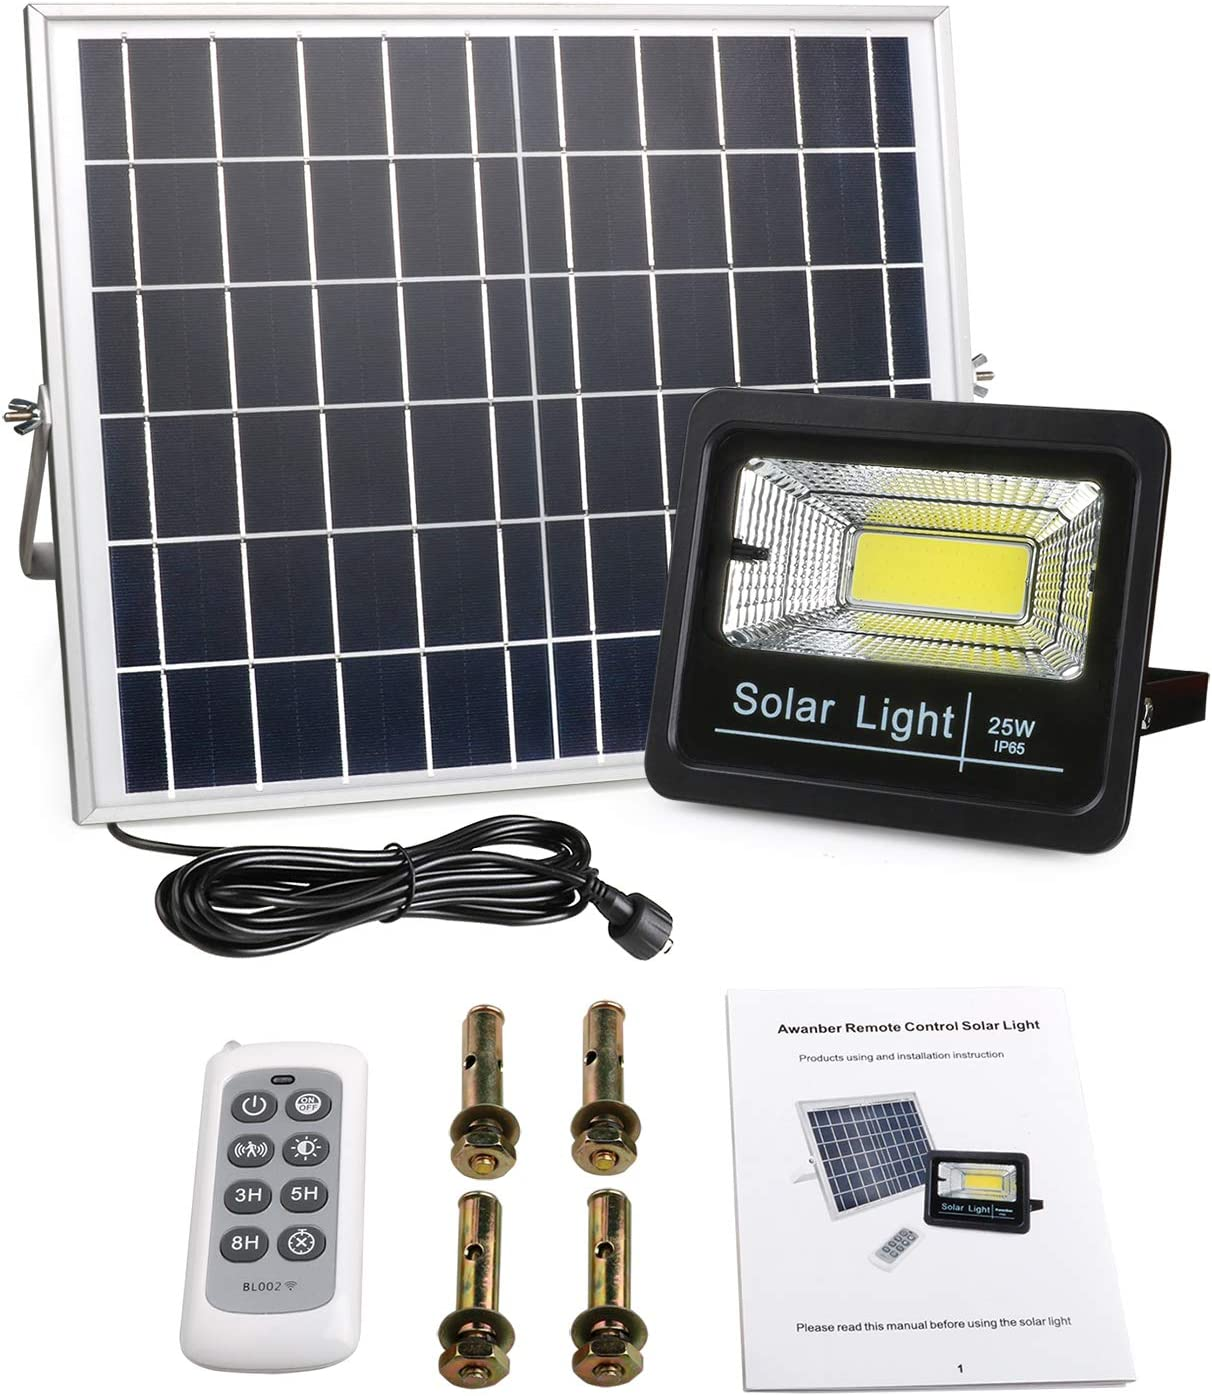 Awanber New Version Solar Flood Lights